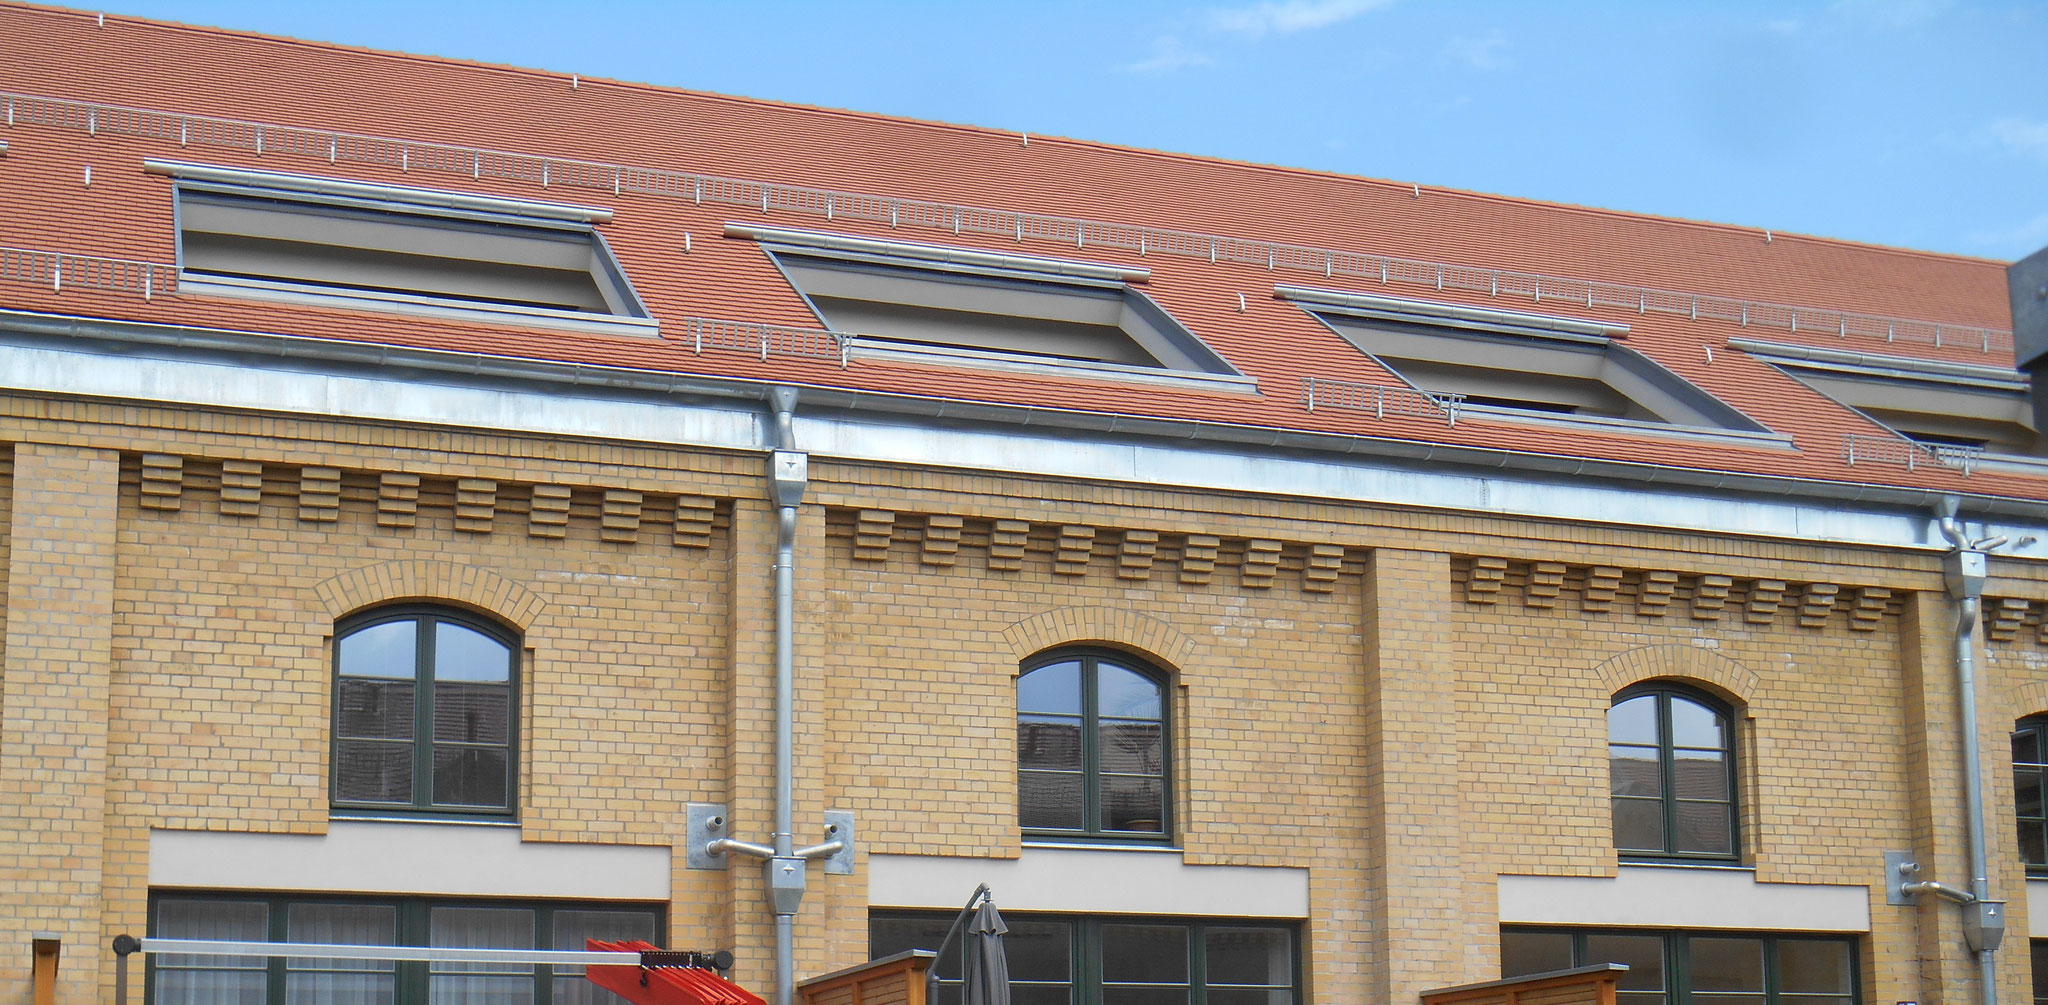 Umbau Sporthalle Th.-Körner-Kaserne in moderne Wohnungen